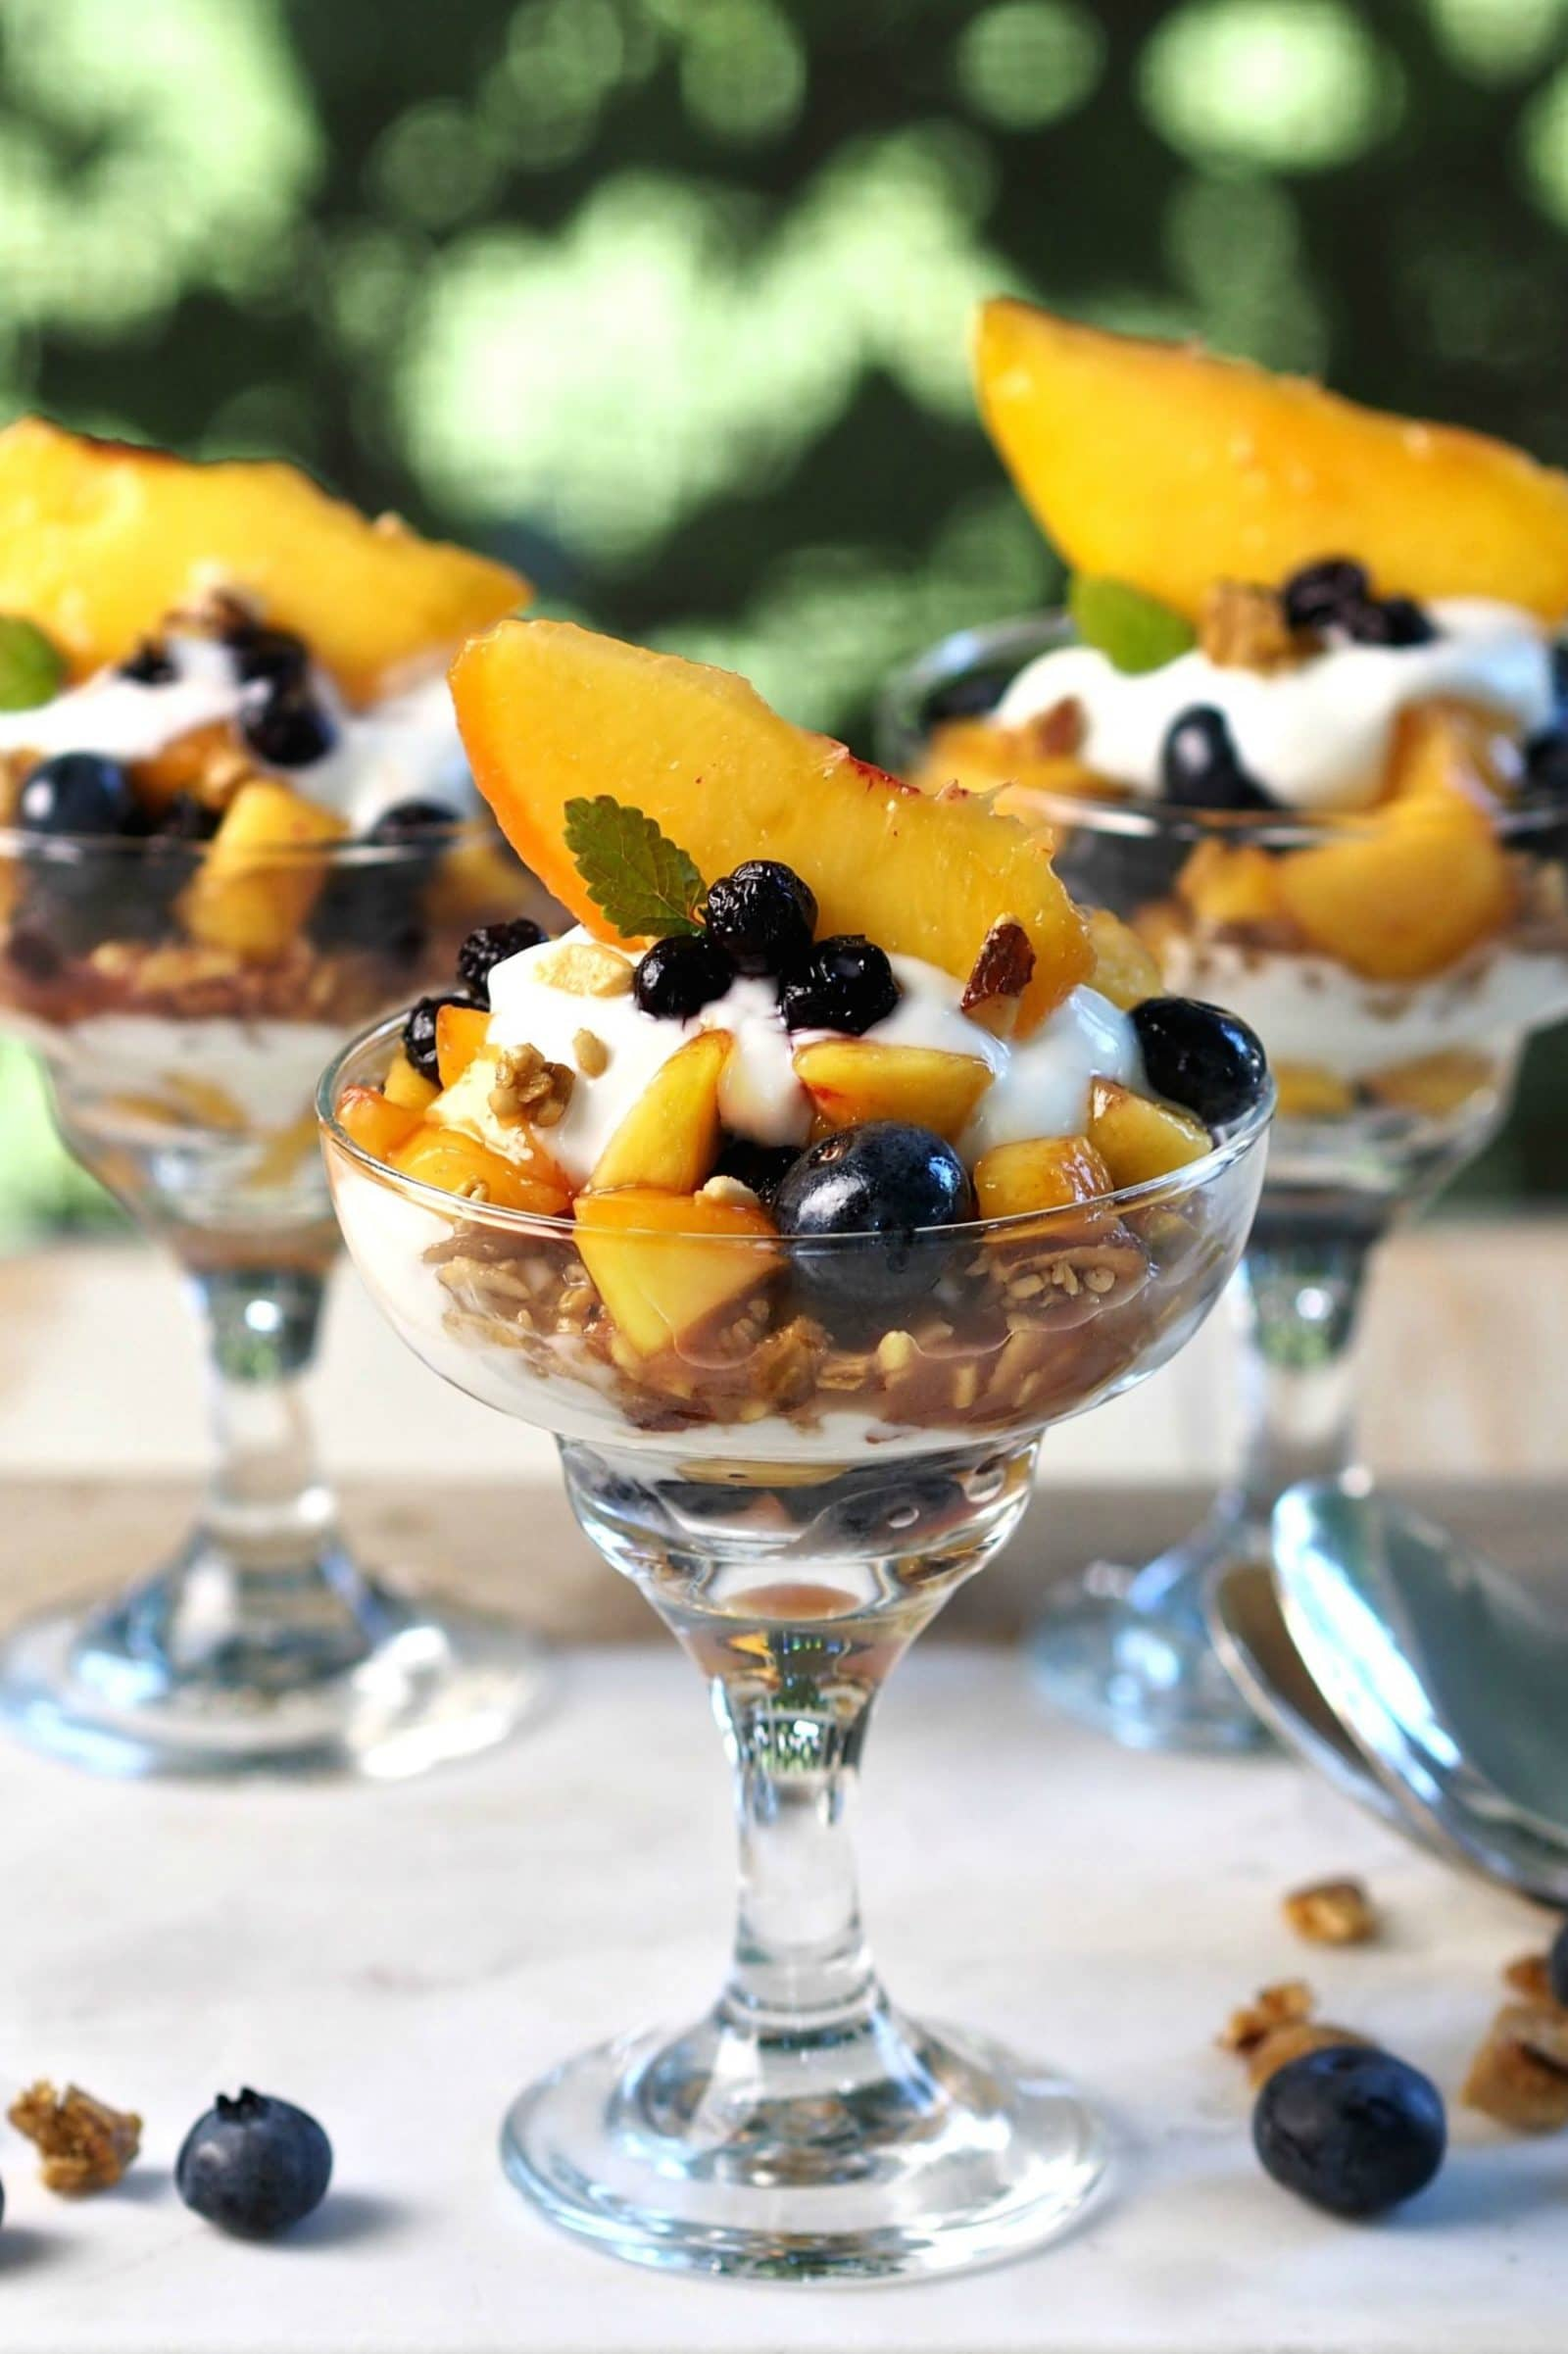 Blueberry Peach Yogurt Parfaits - the perfect healthy breakfast or dessert. Fresh fruit, Greek yogurt, Maple Granola - smooth, naturally sweet & crunchy. Simply Sated